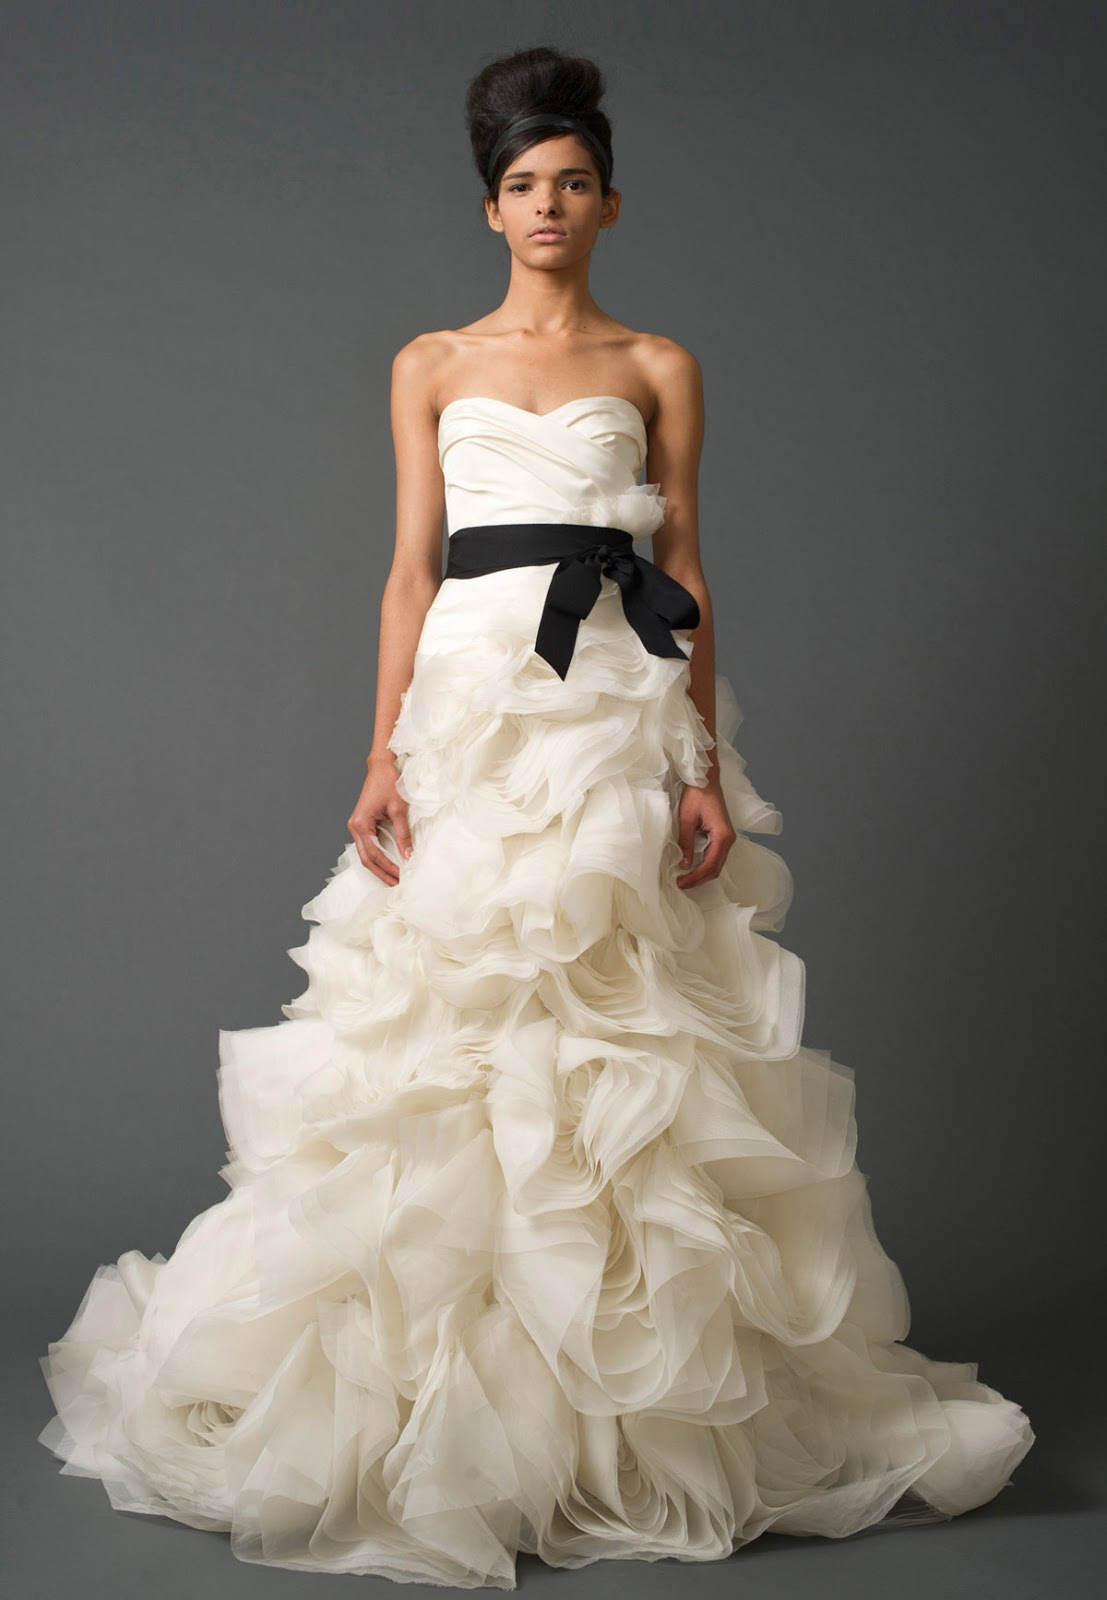 Bridesmaid Dresses 2015, Vera Wang Dresses, Bridal Dresses 2015, Simply Vera Wang Clothing, Vera Wang Mother of the Bride Dresses, Vera Wang Shoes, Bridesmaid Dresses, Vera Wang Cocktail Dresses